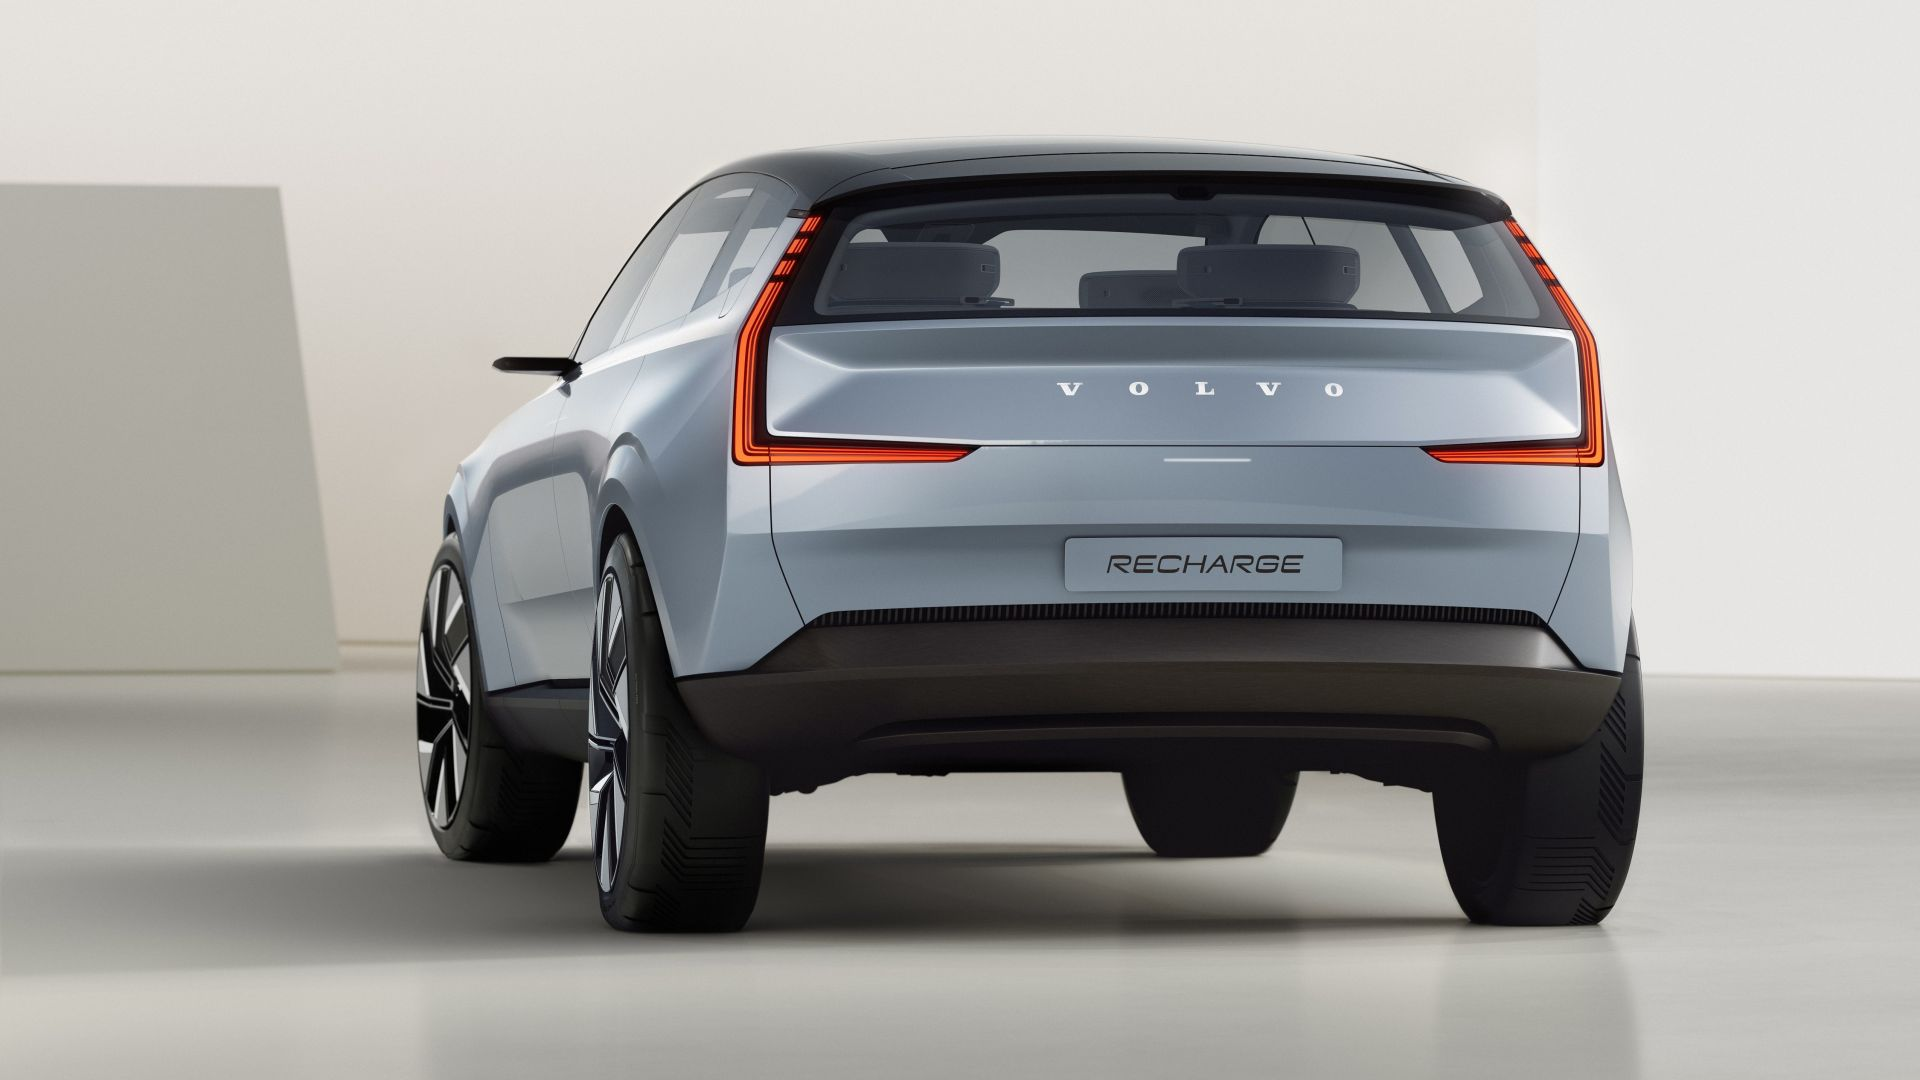 Kako Volvo zamišlja električnu budućnost pokazuje konceptom Recharge